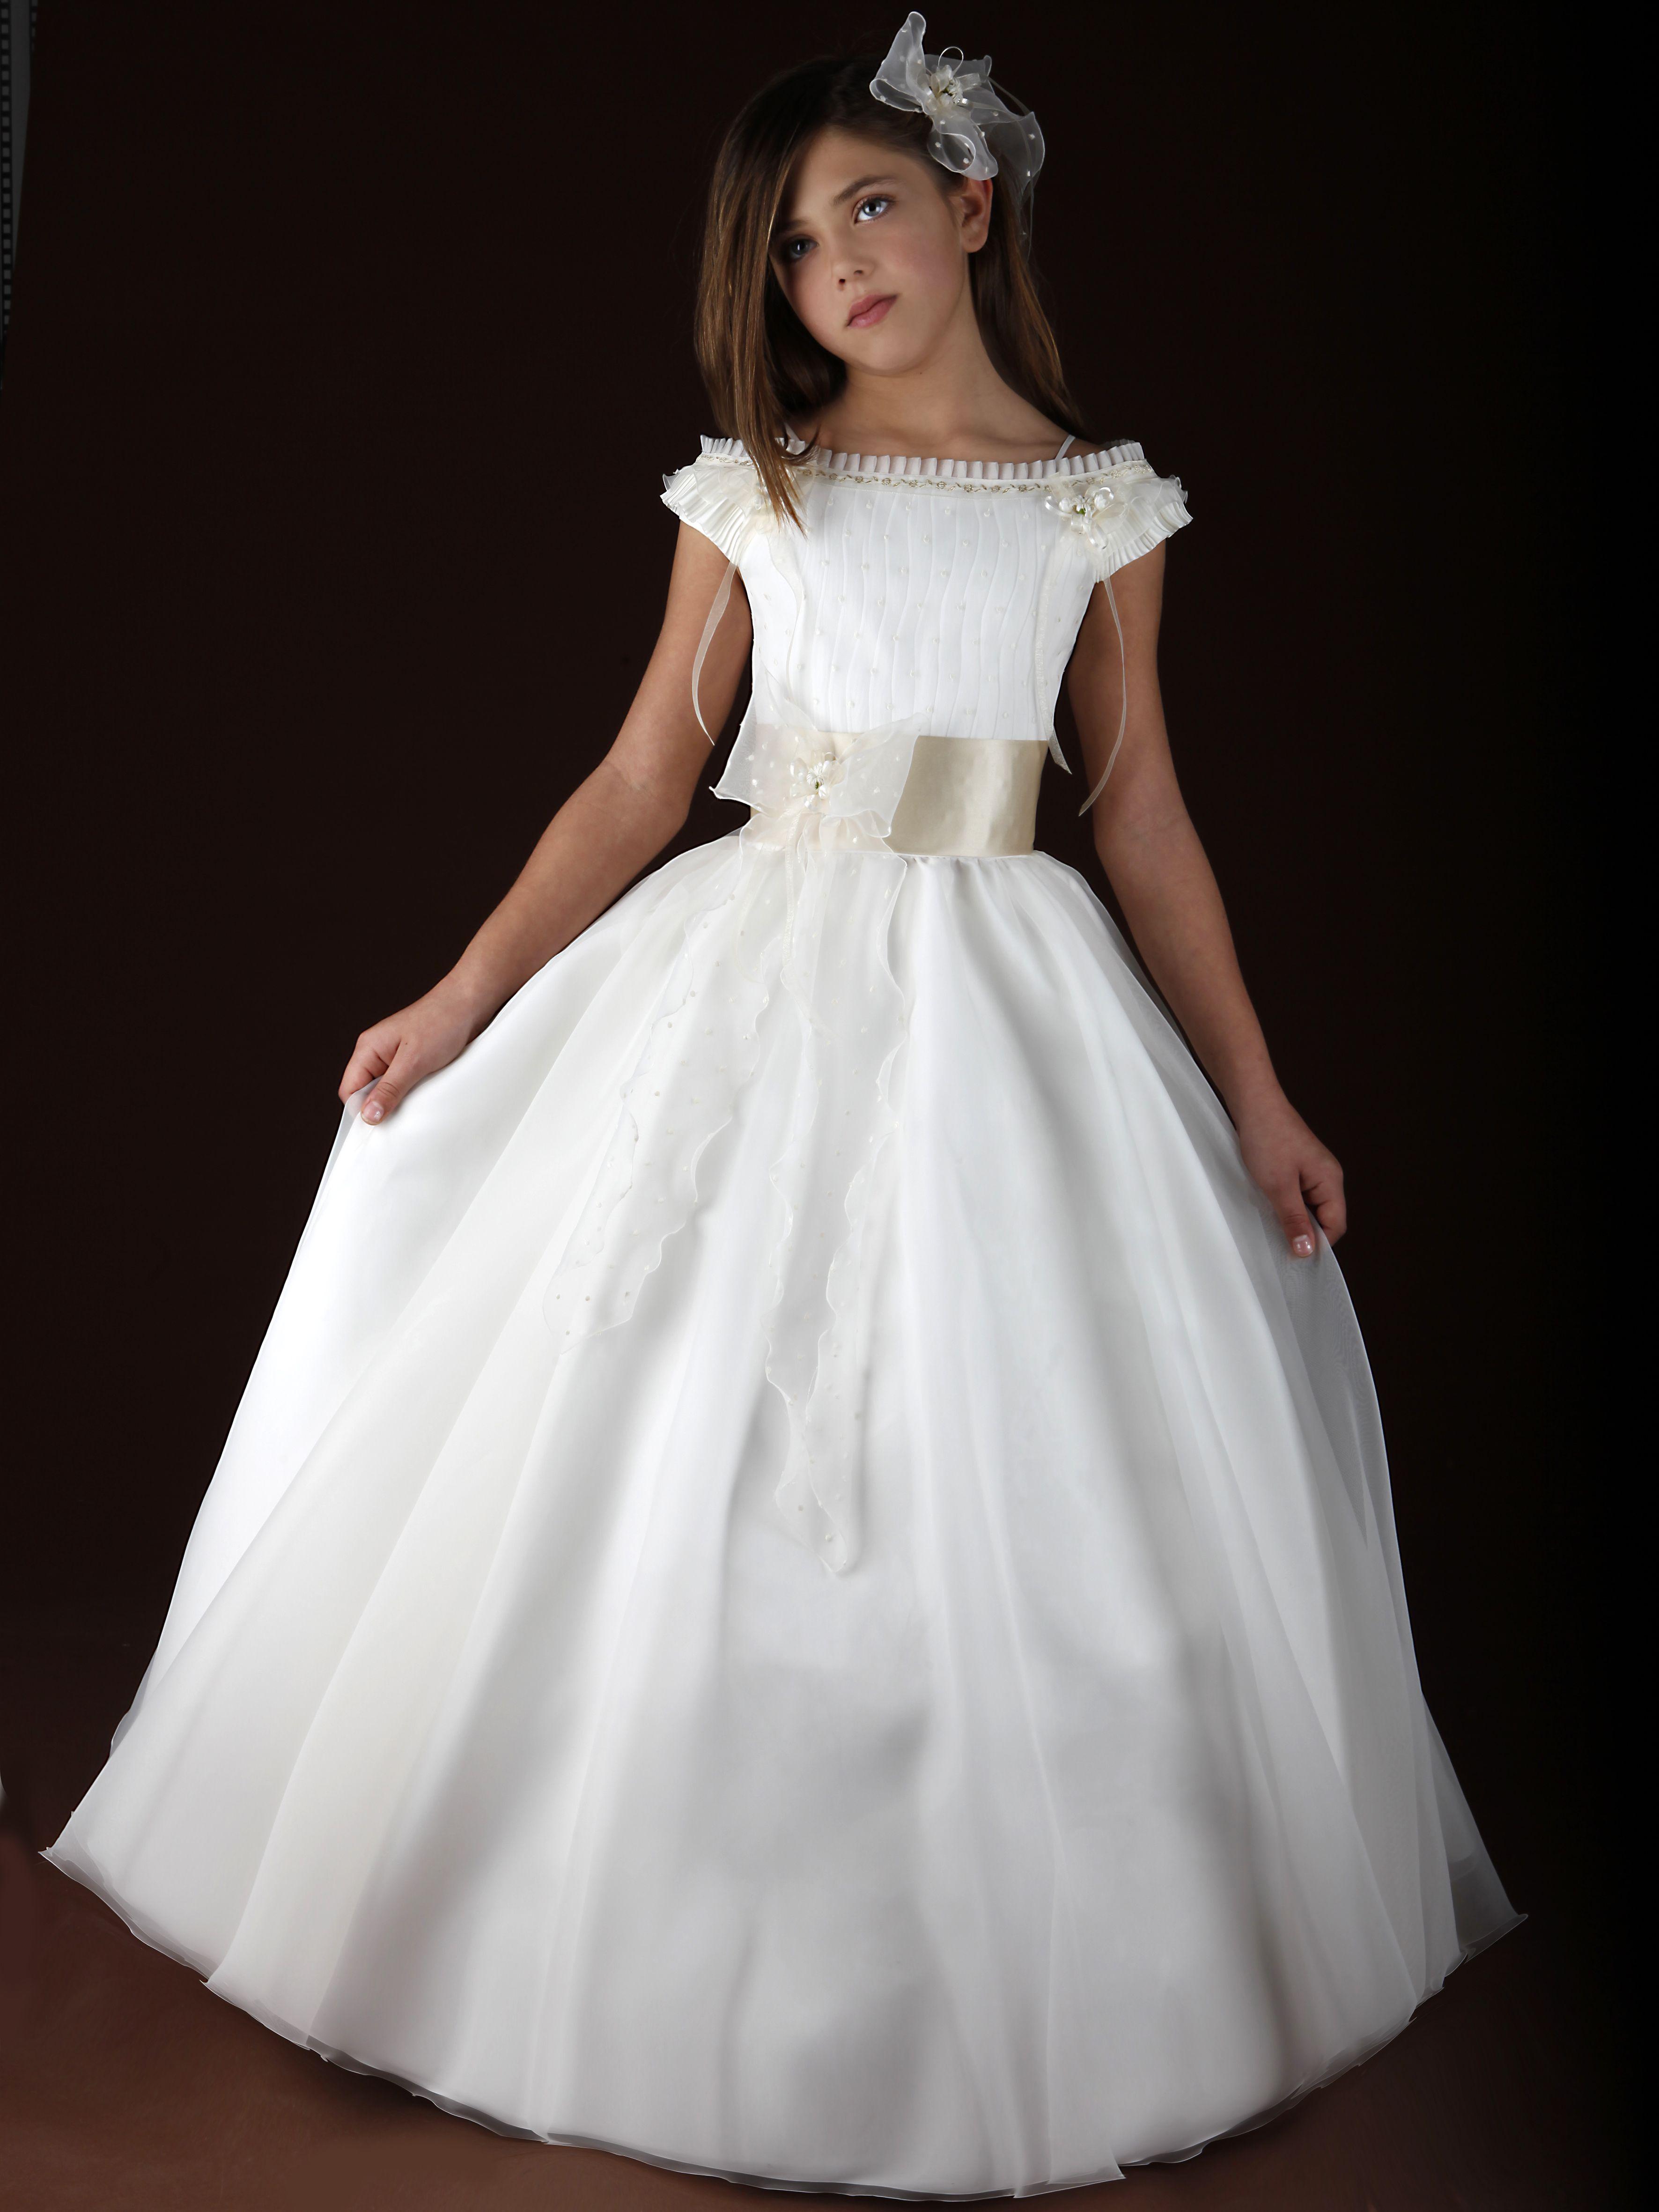 Vestidos de primera comunion mas bonitos